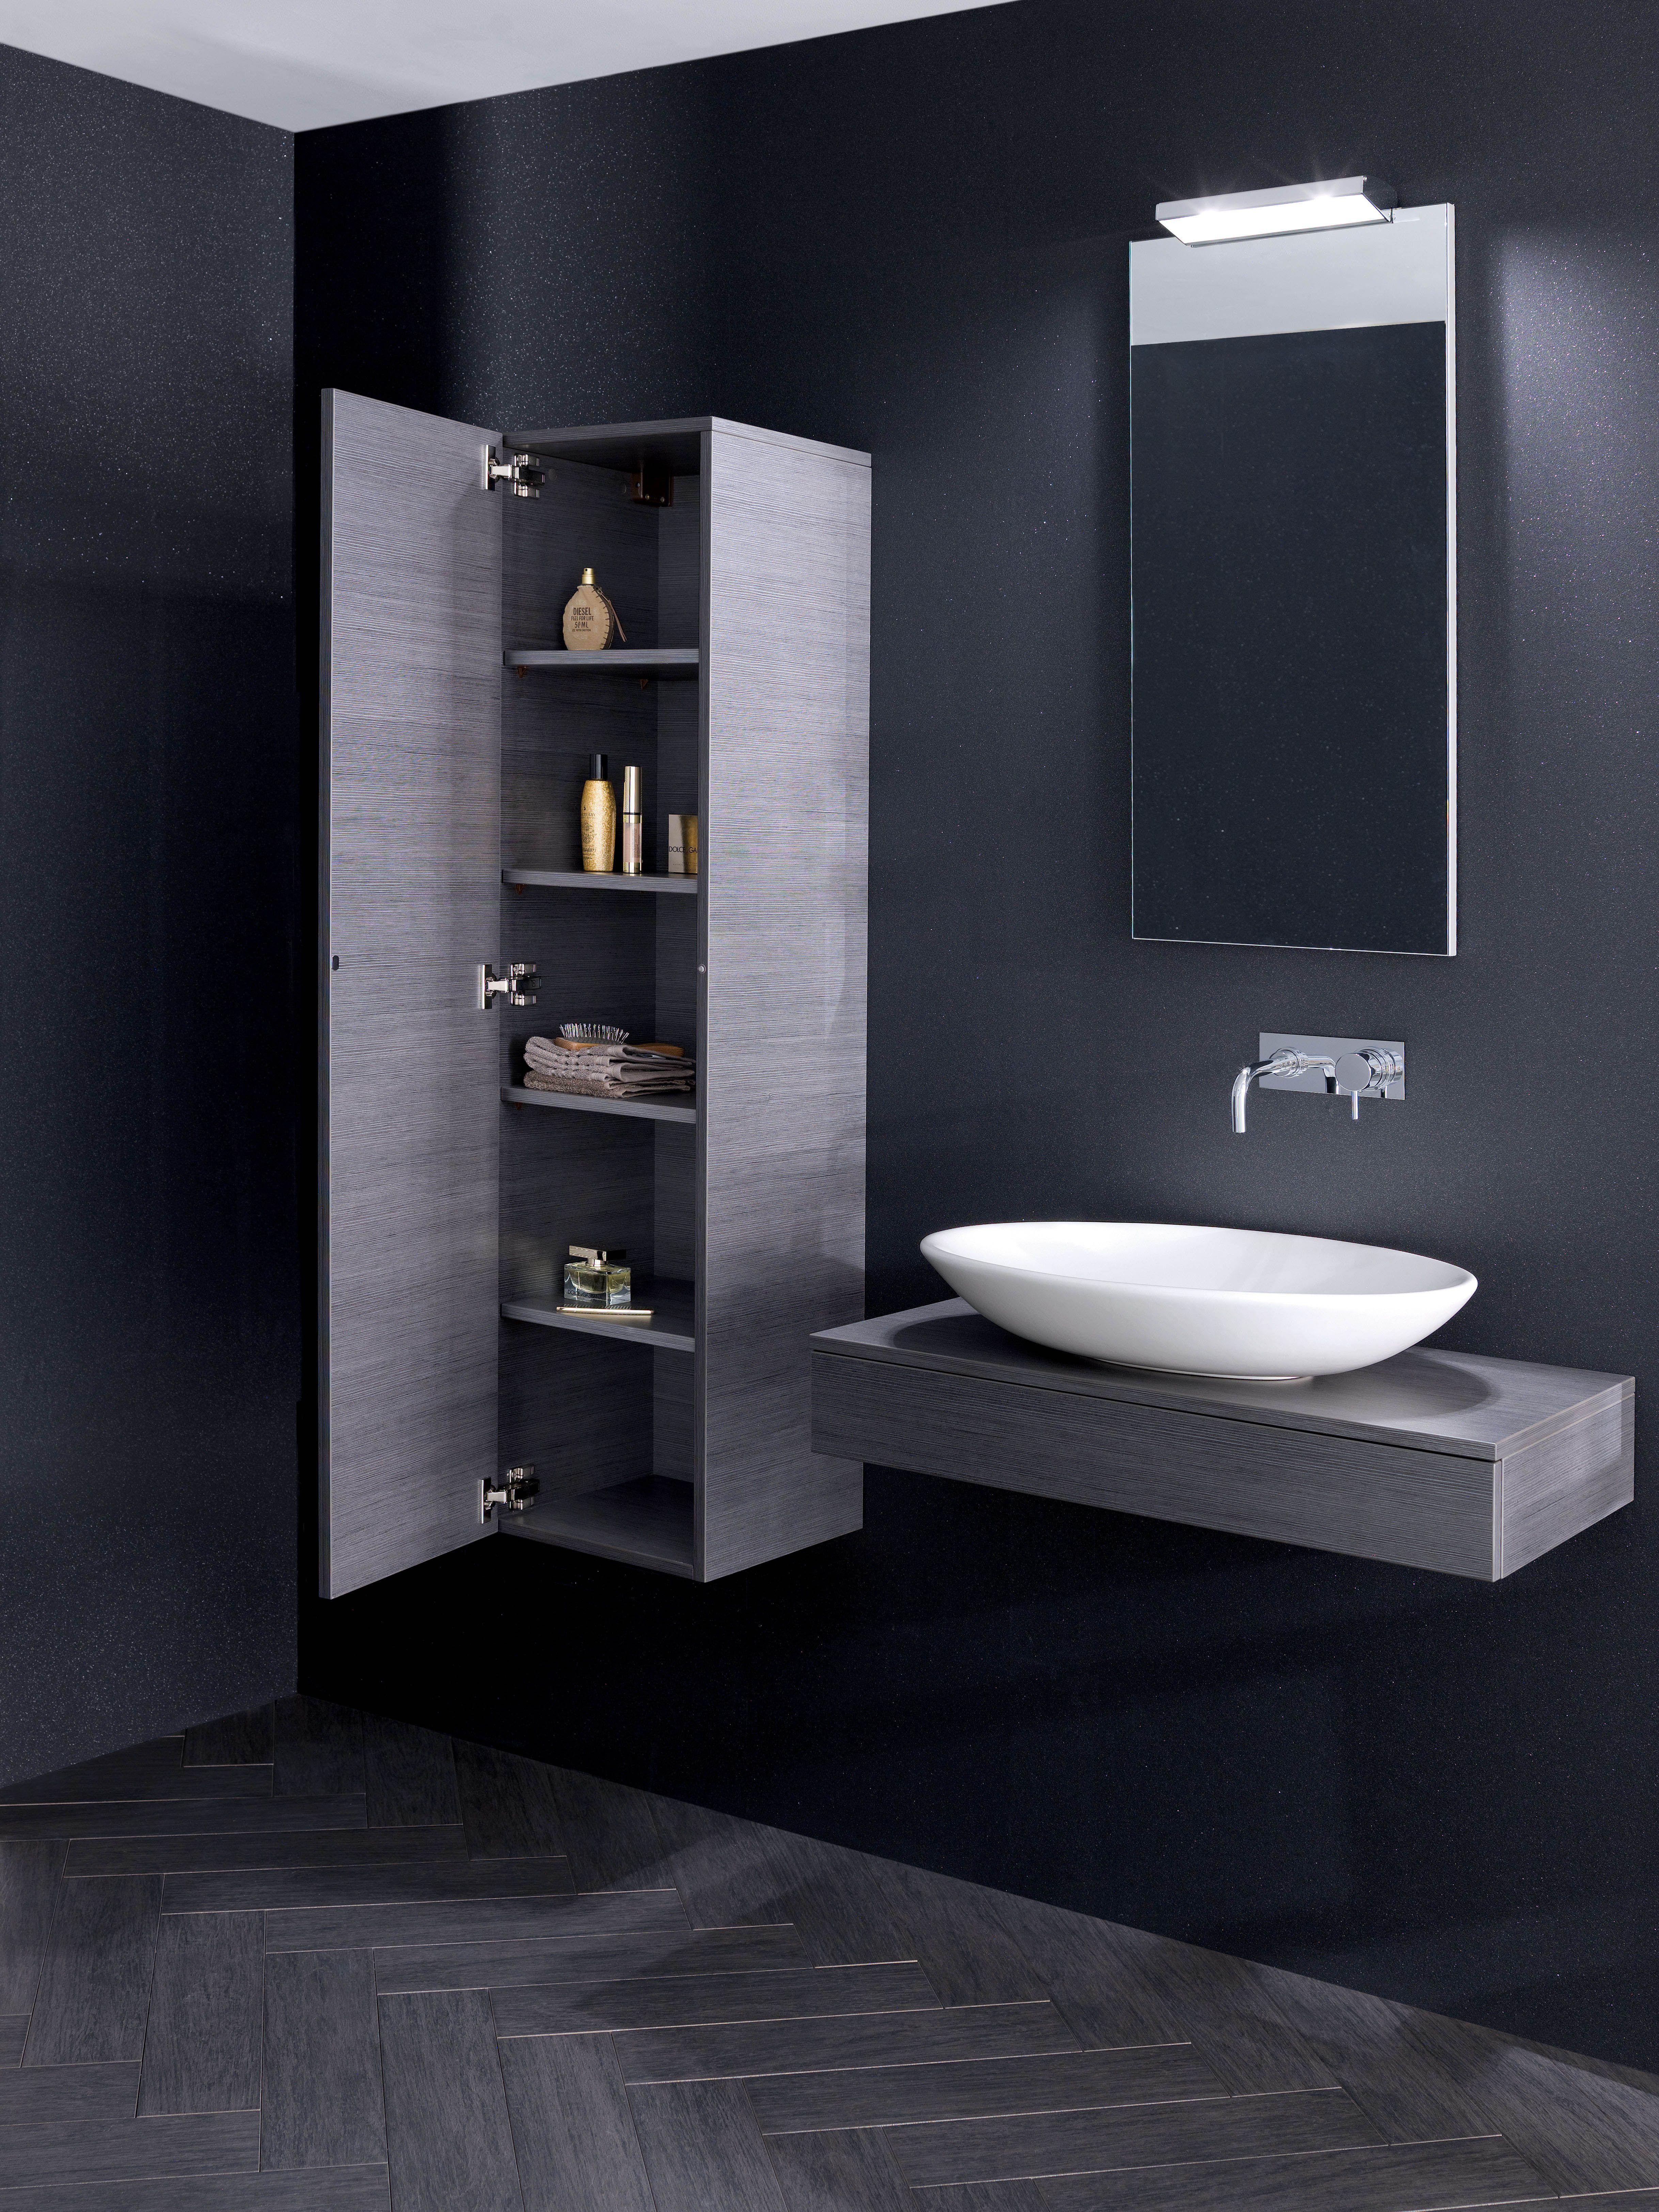 Edge Steel Bathroom Furniture Range From Crosswater Httpwwwbauhaus Bathrooms